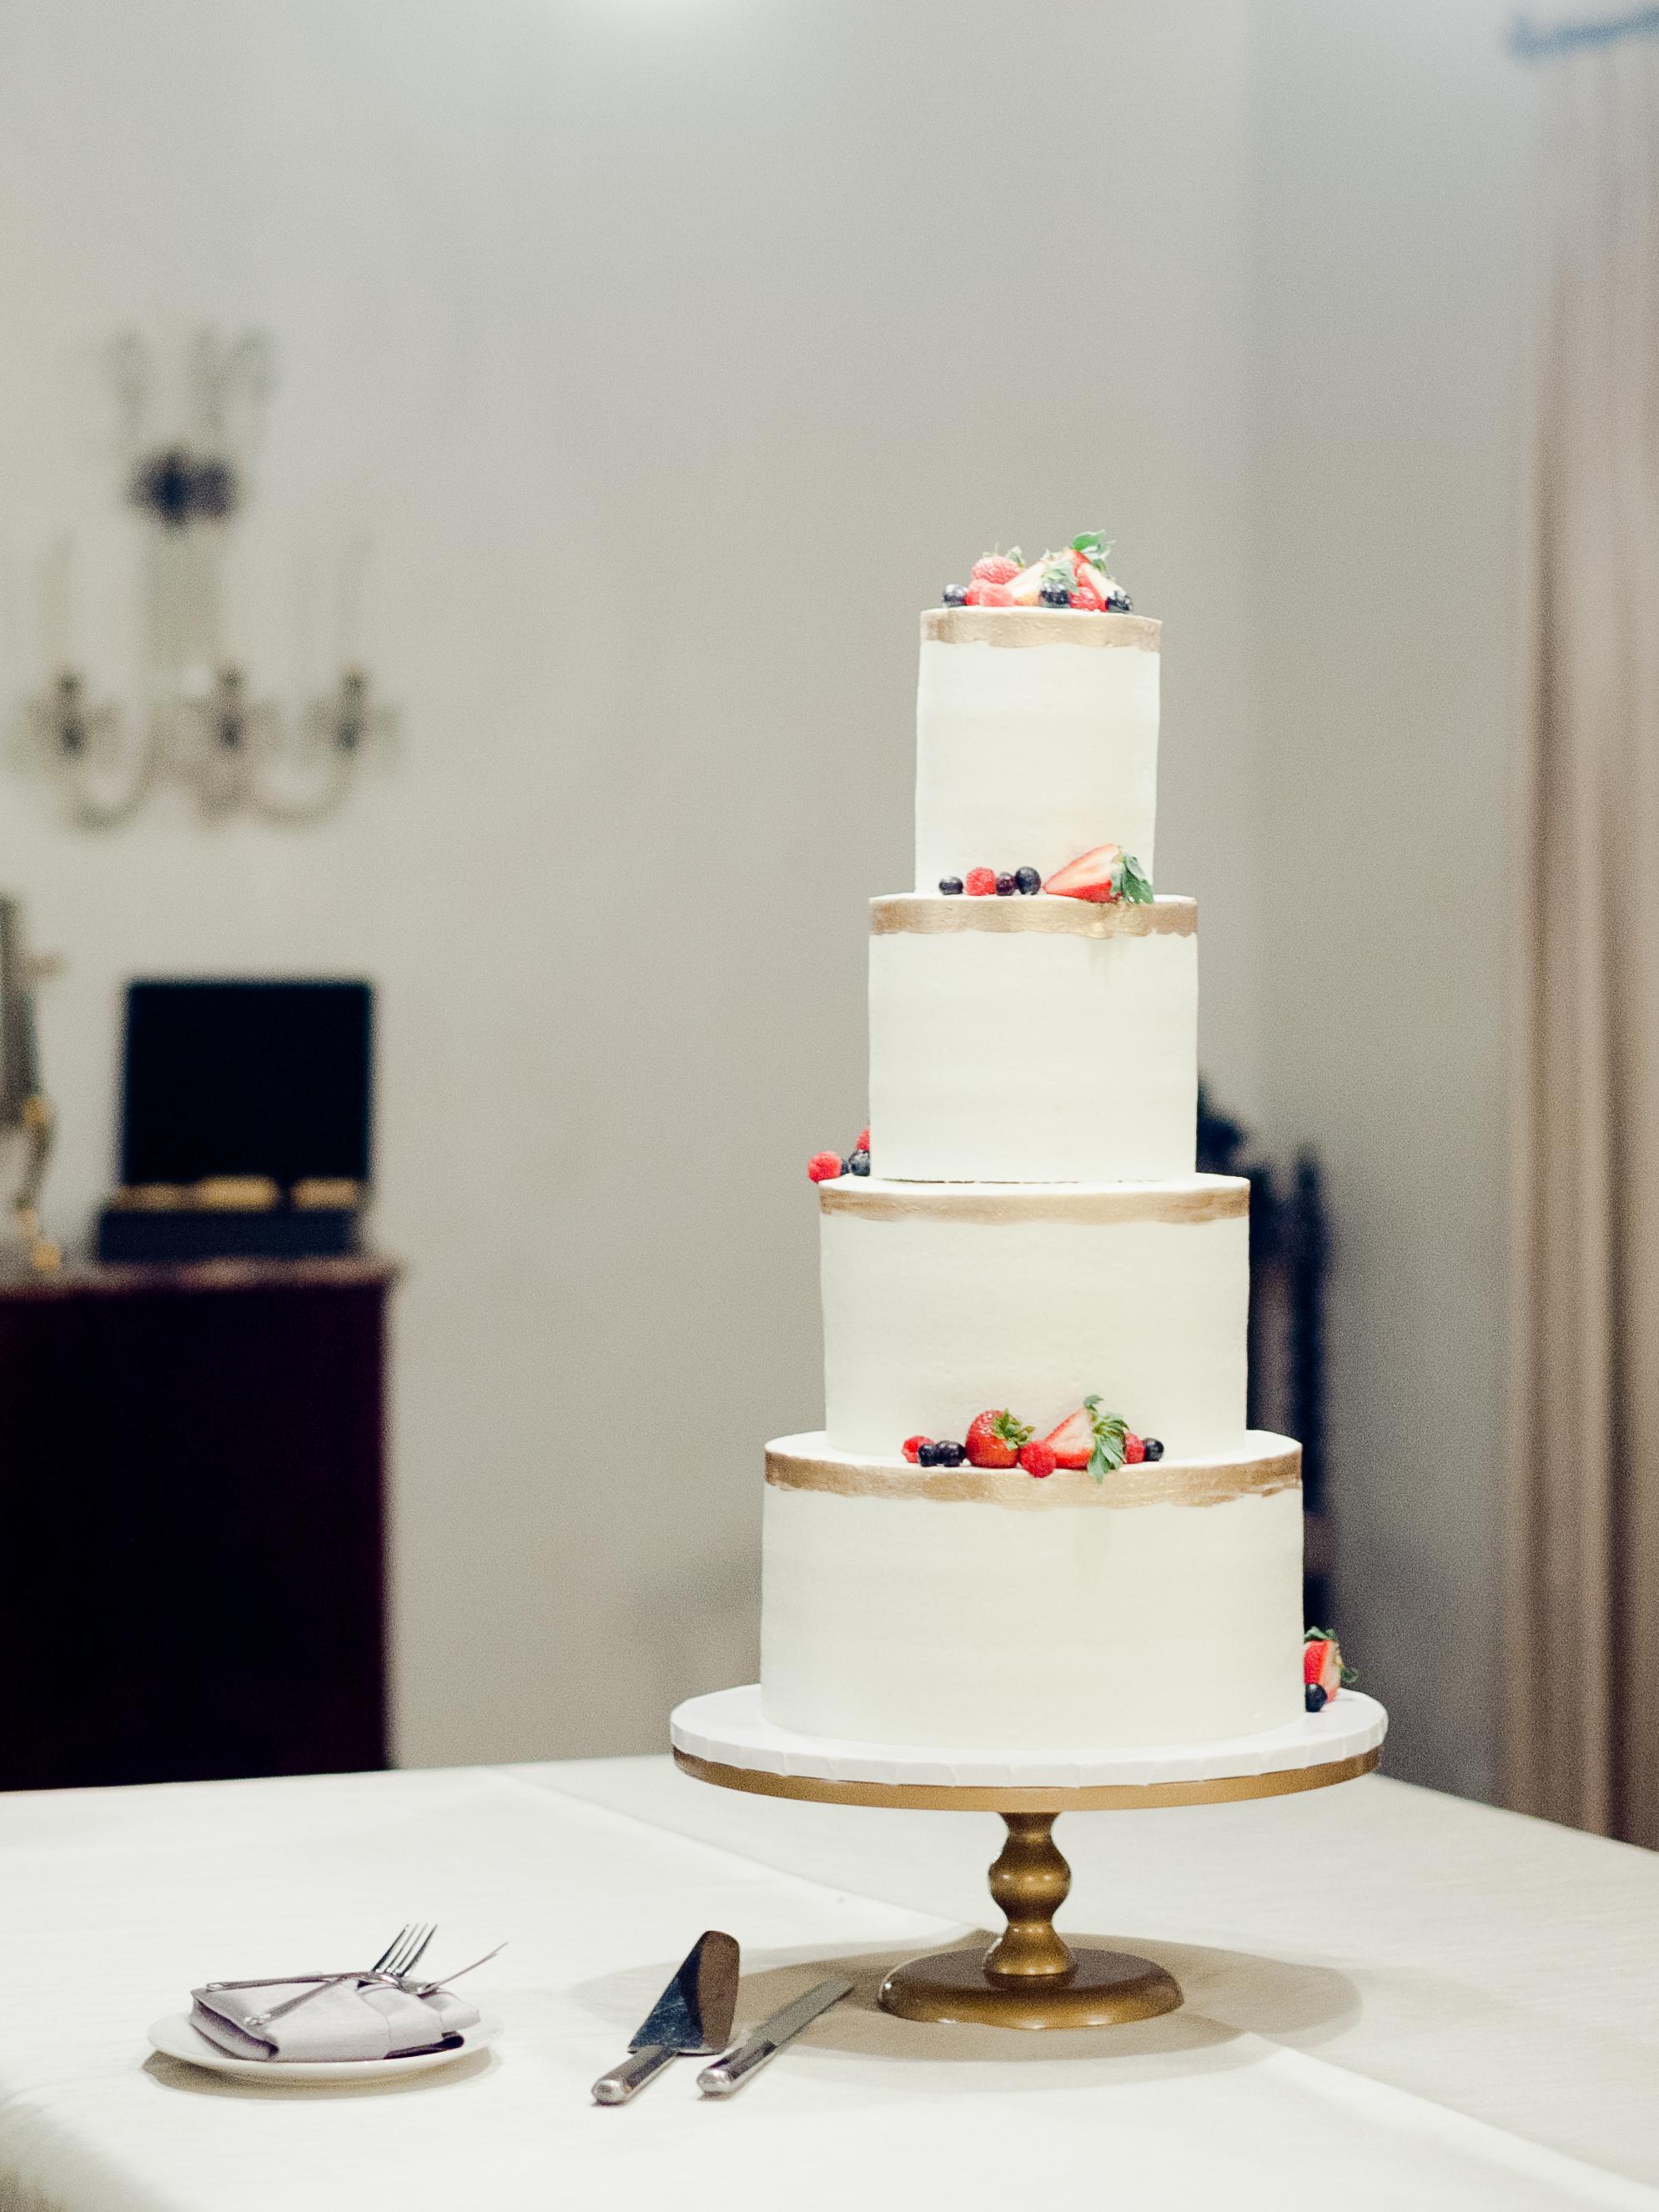 anuja nikhil wedding cake